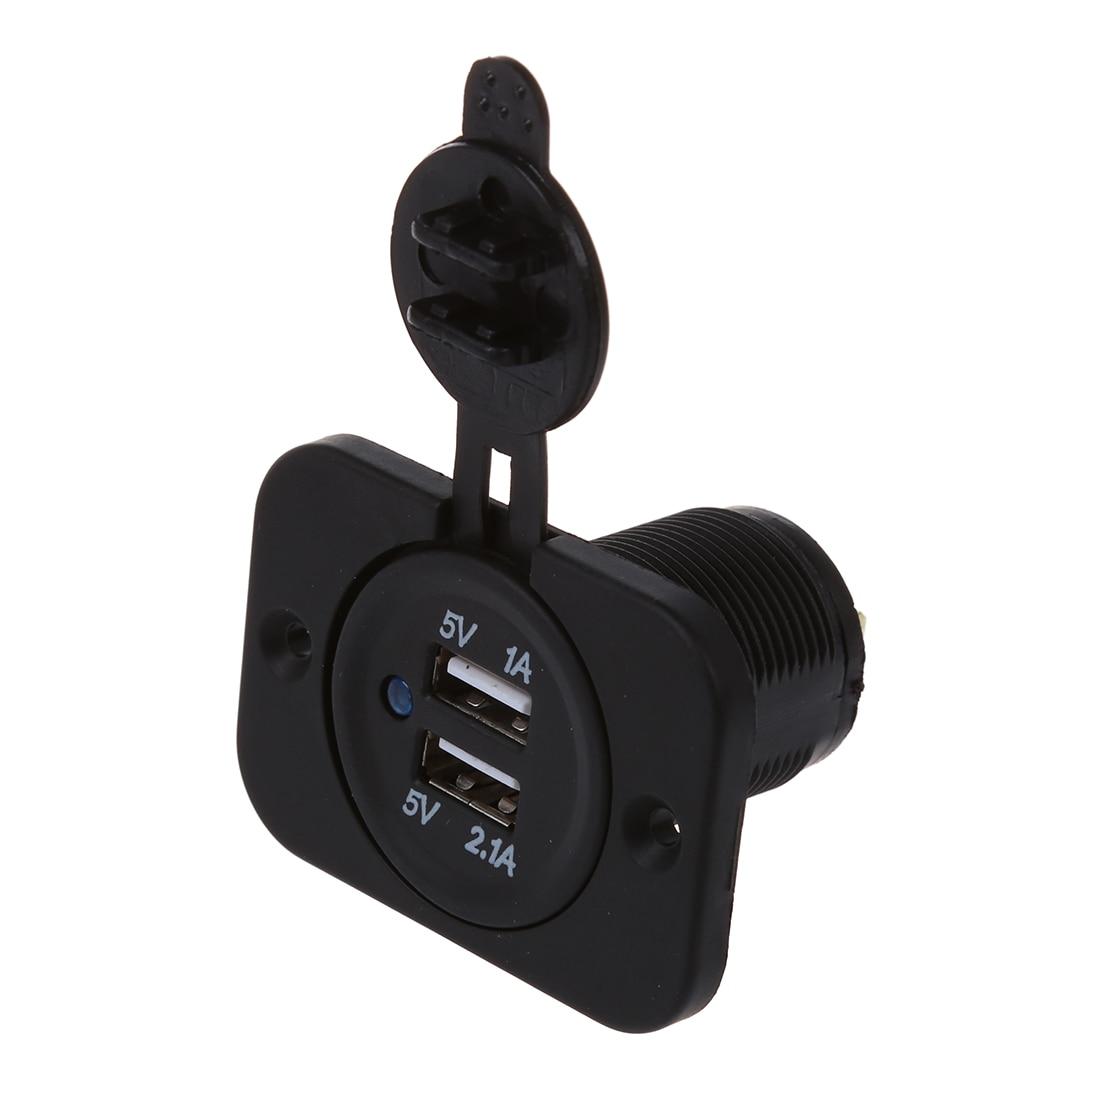 AUTO Adaptateur Prise 2 Ports USB Allume Cigare Chargeur 12V for Auto Voiture